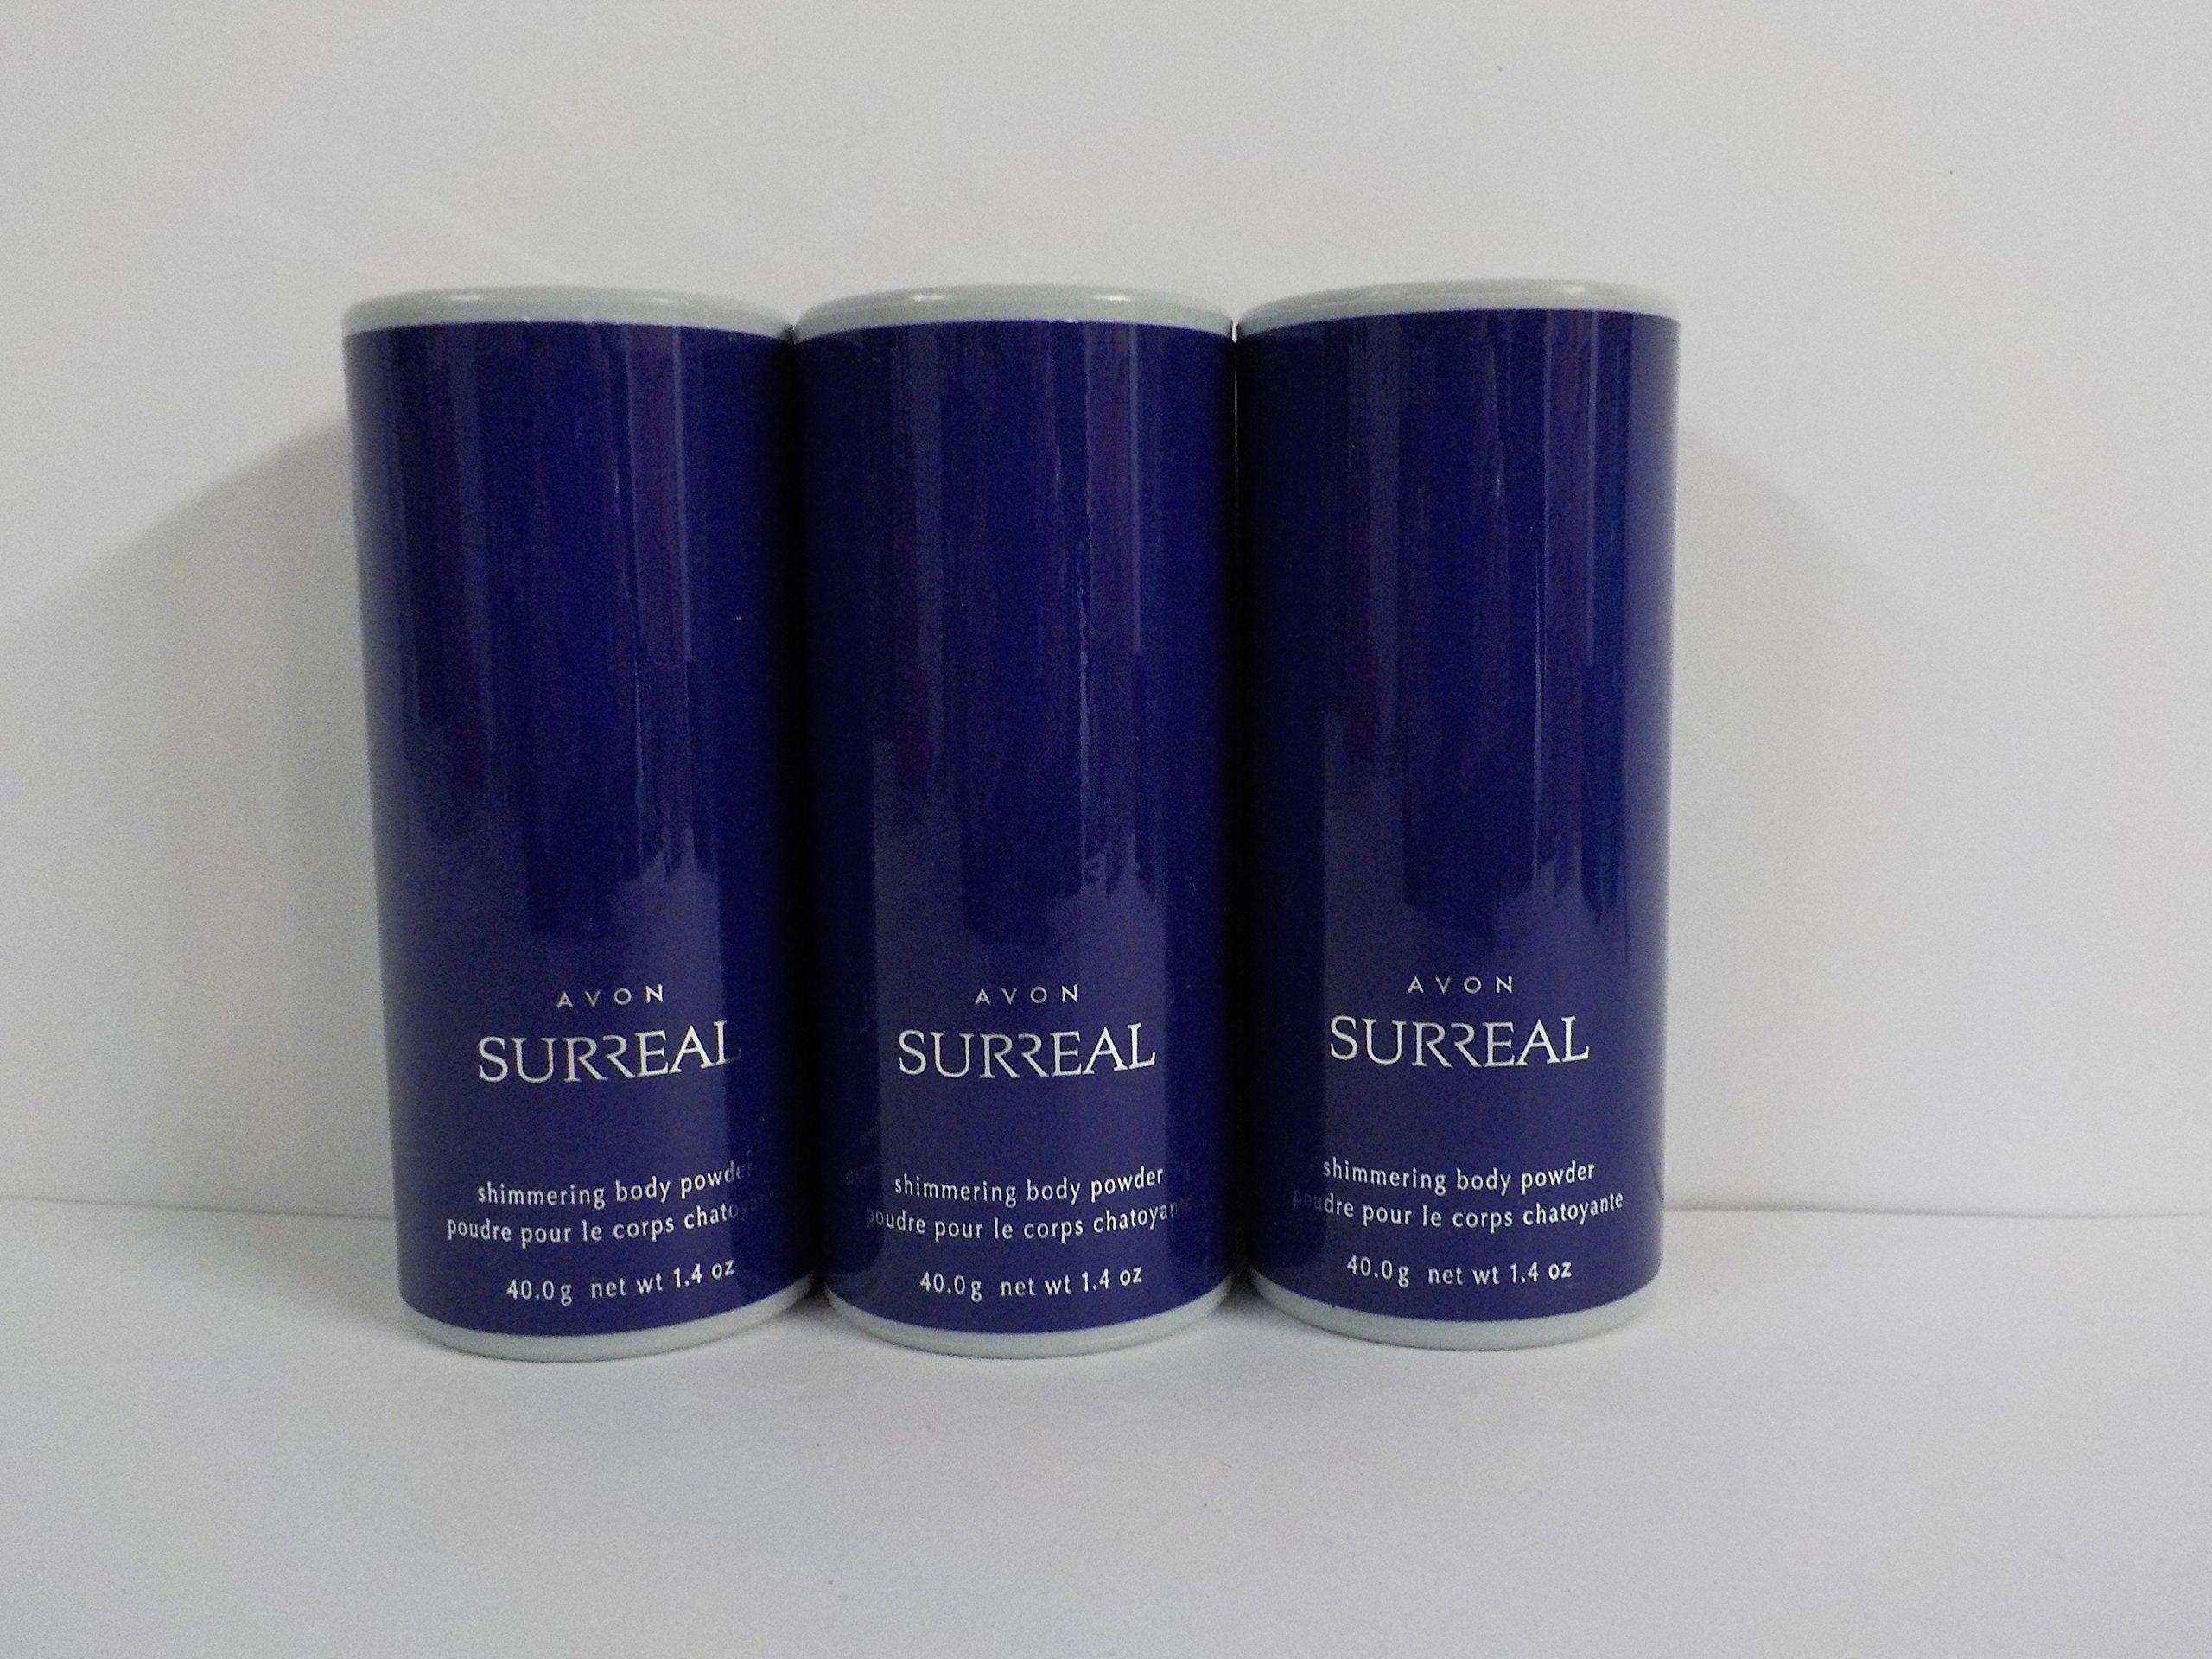 Avon Surreal Shimmering Body Powder 1.4 Oz. (Lot of 3)